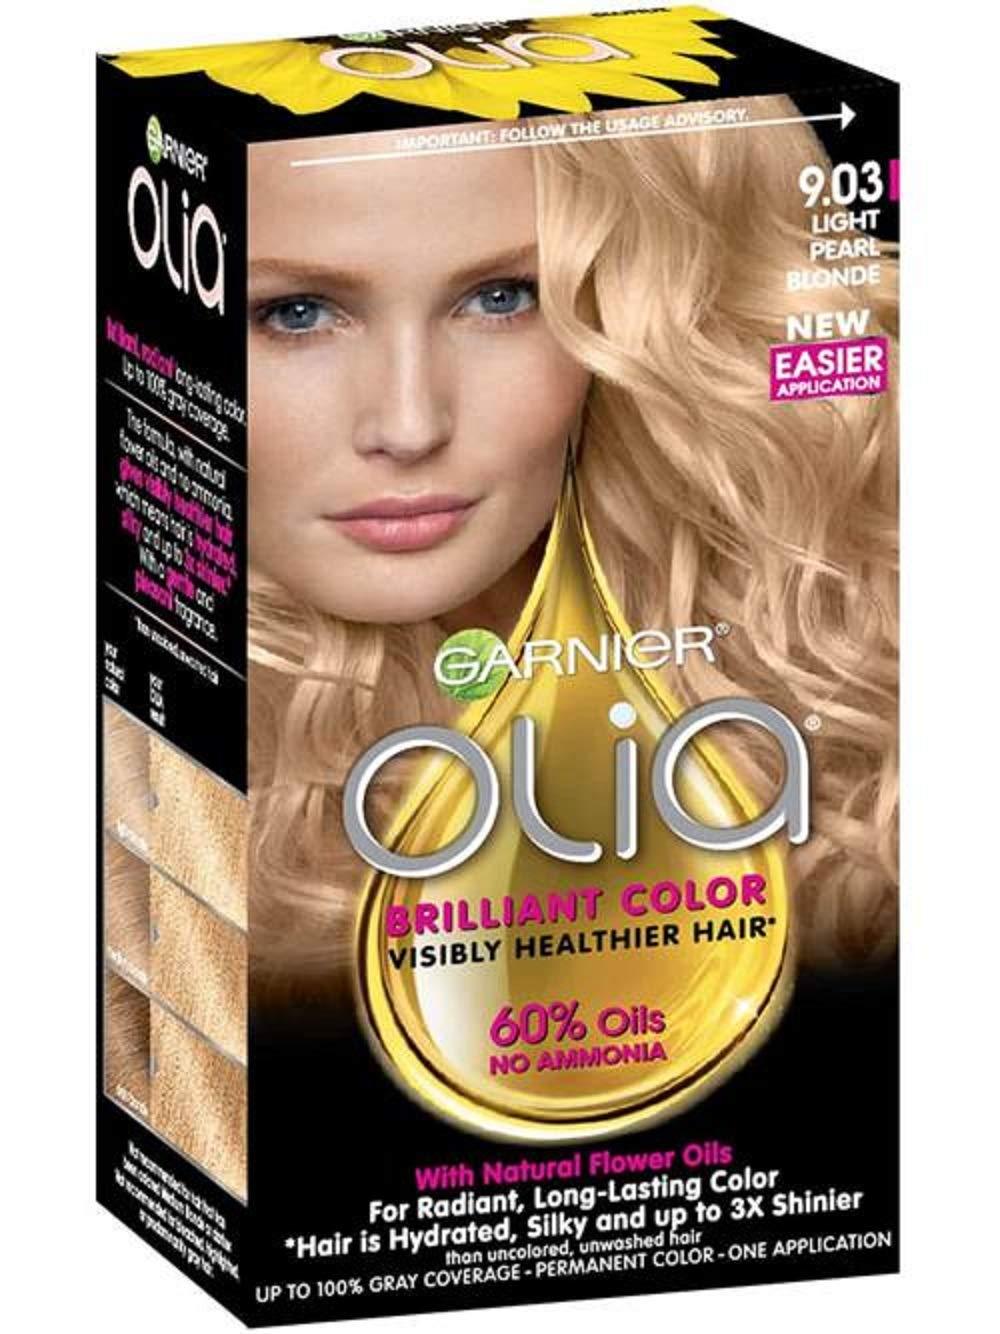 Garnier Olia Hair Color 903 Light Pearl Blonde Ammonia Free